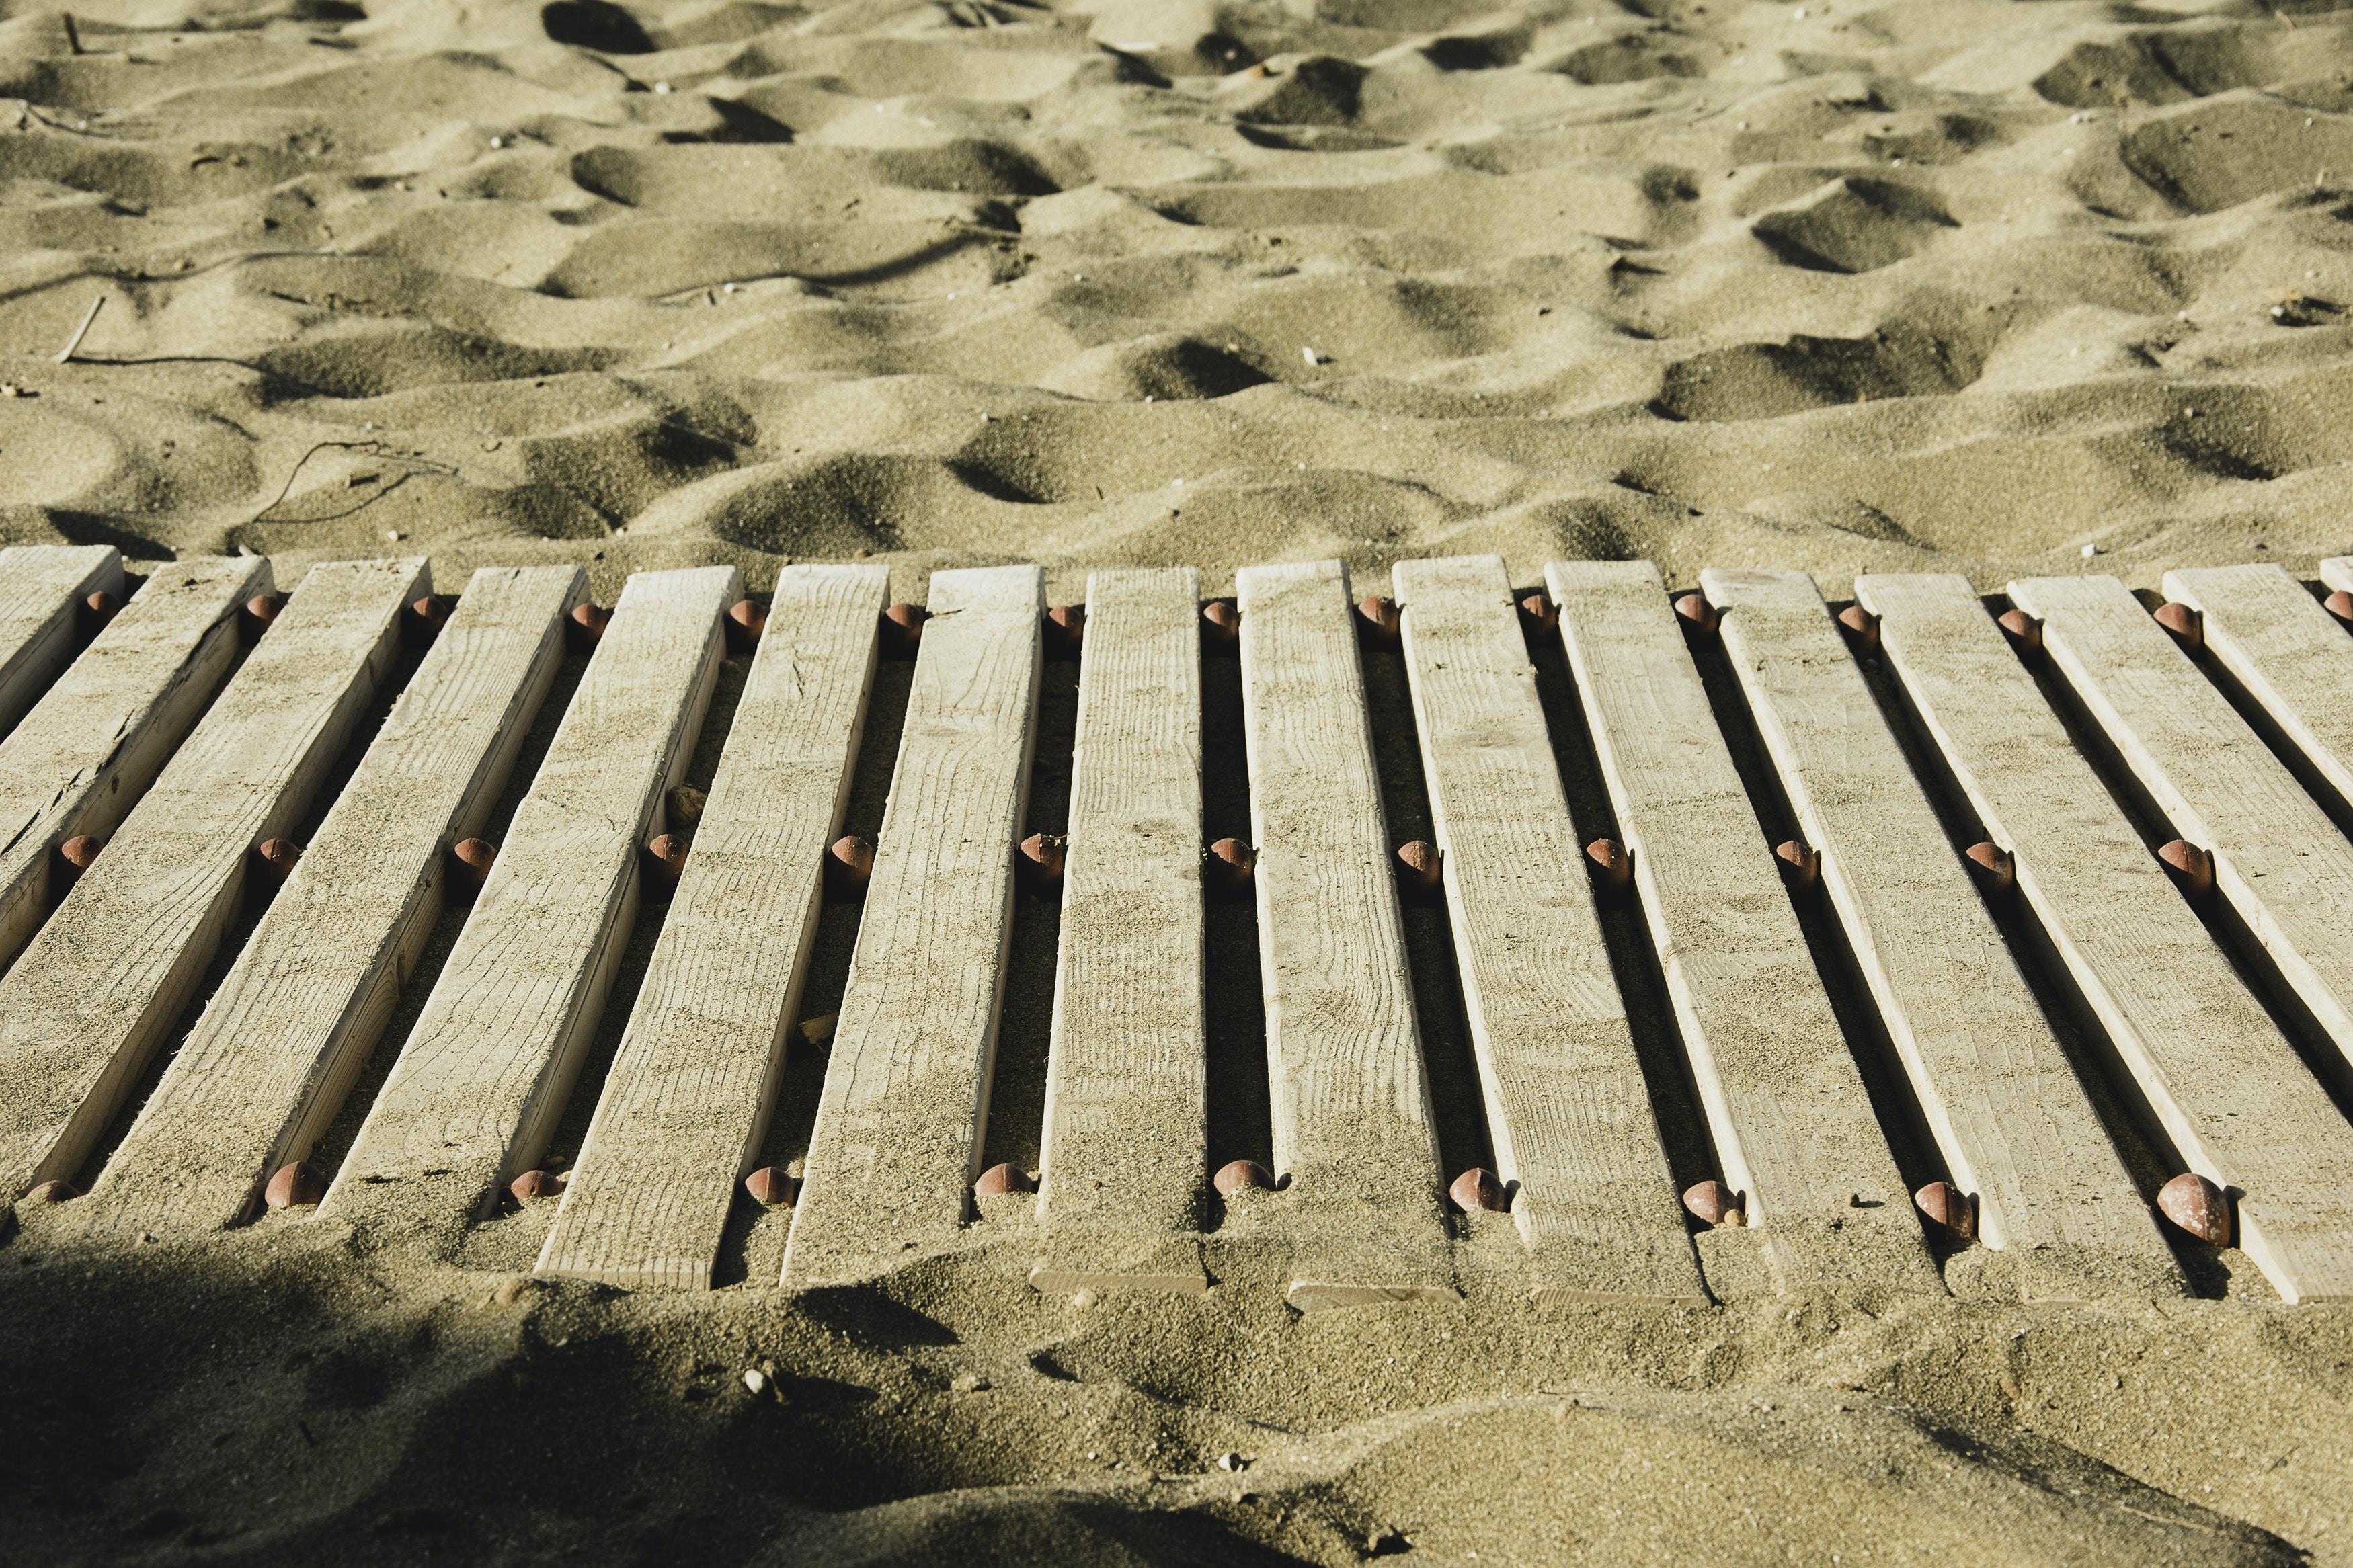 brown wood pallet on sand